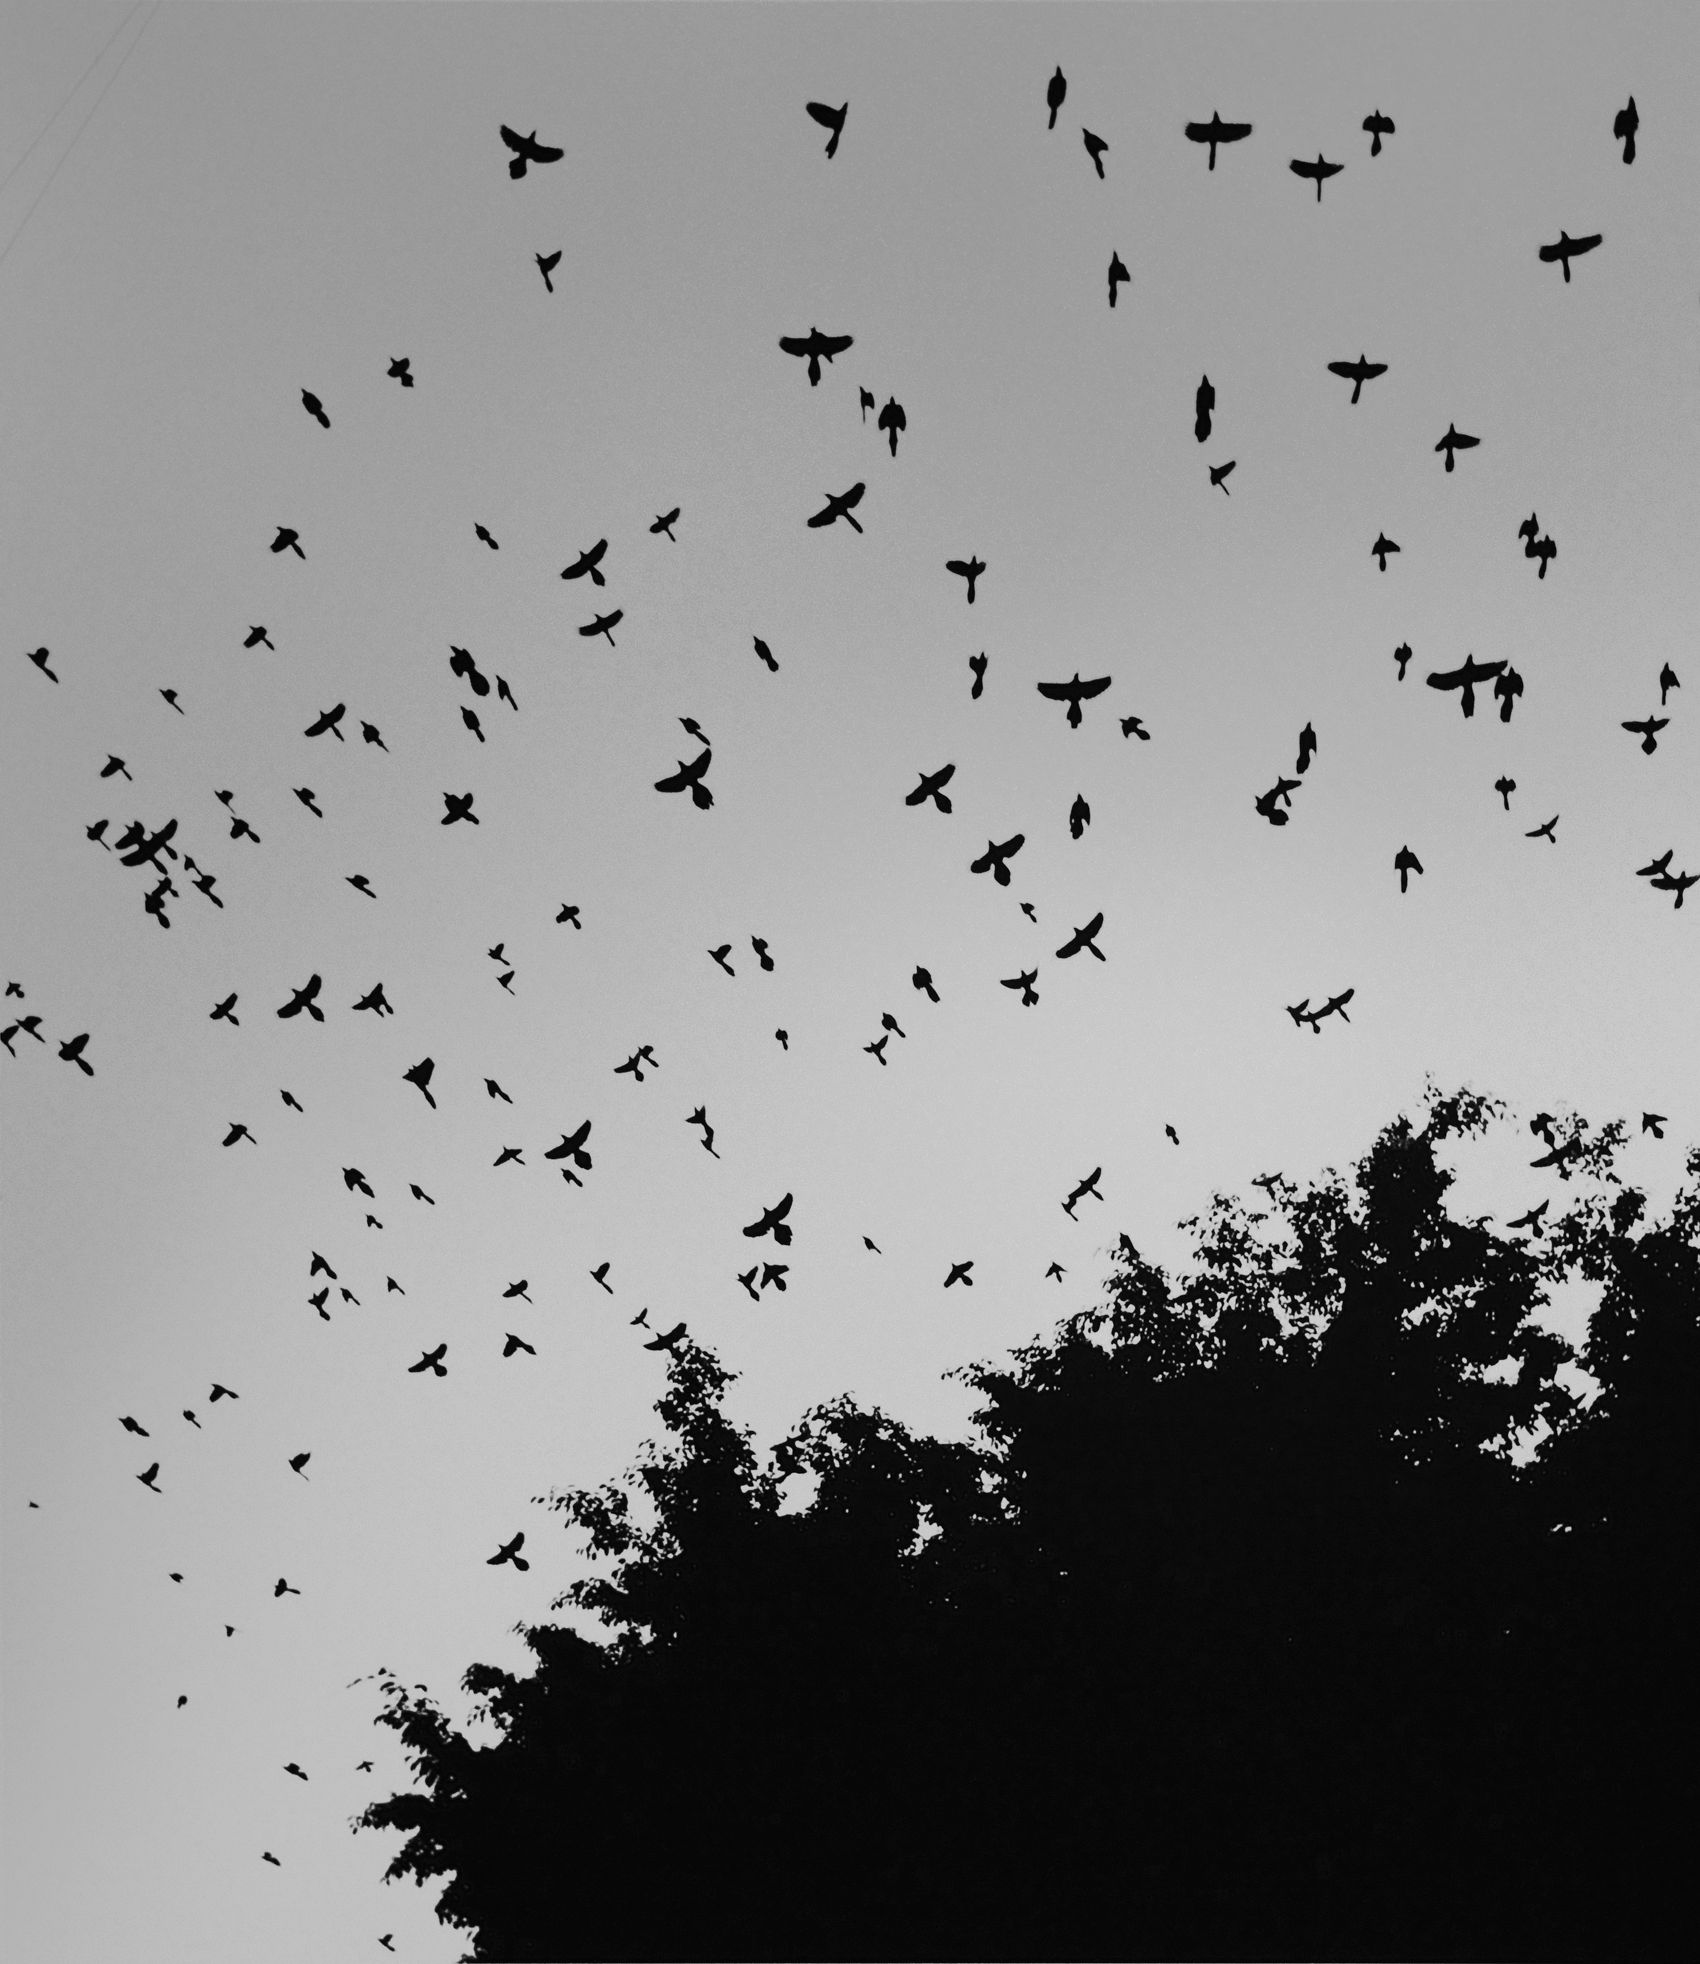 Cacophony of Birds